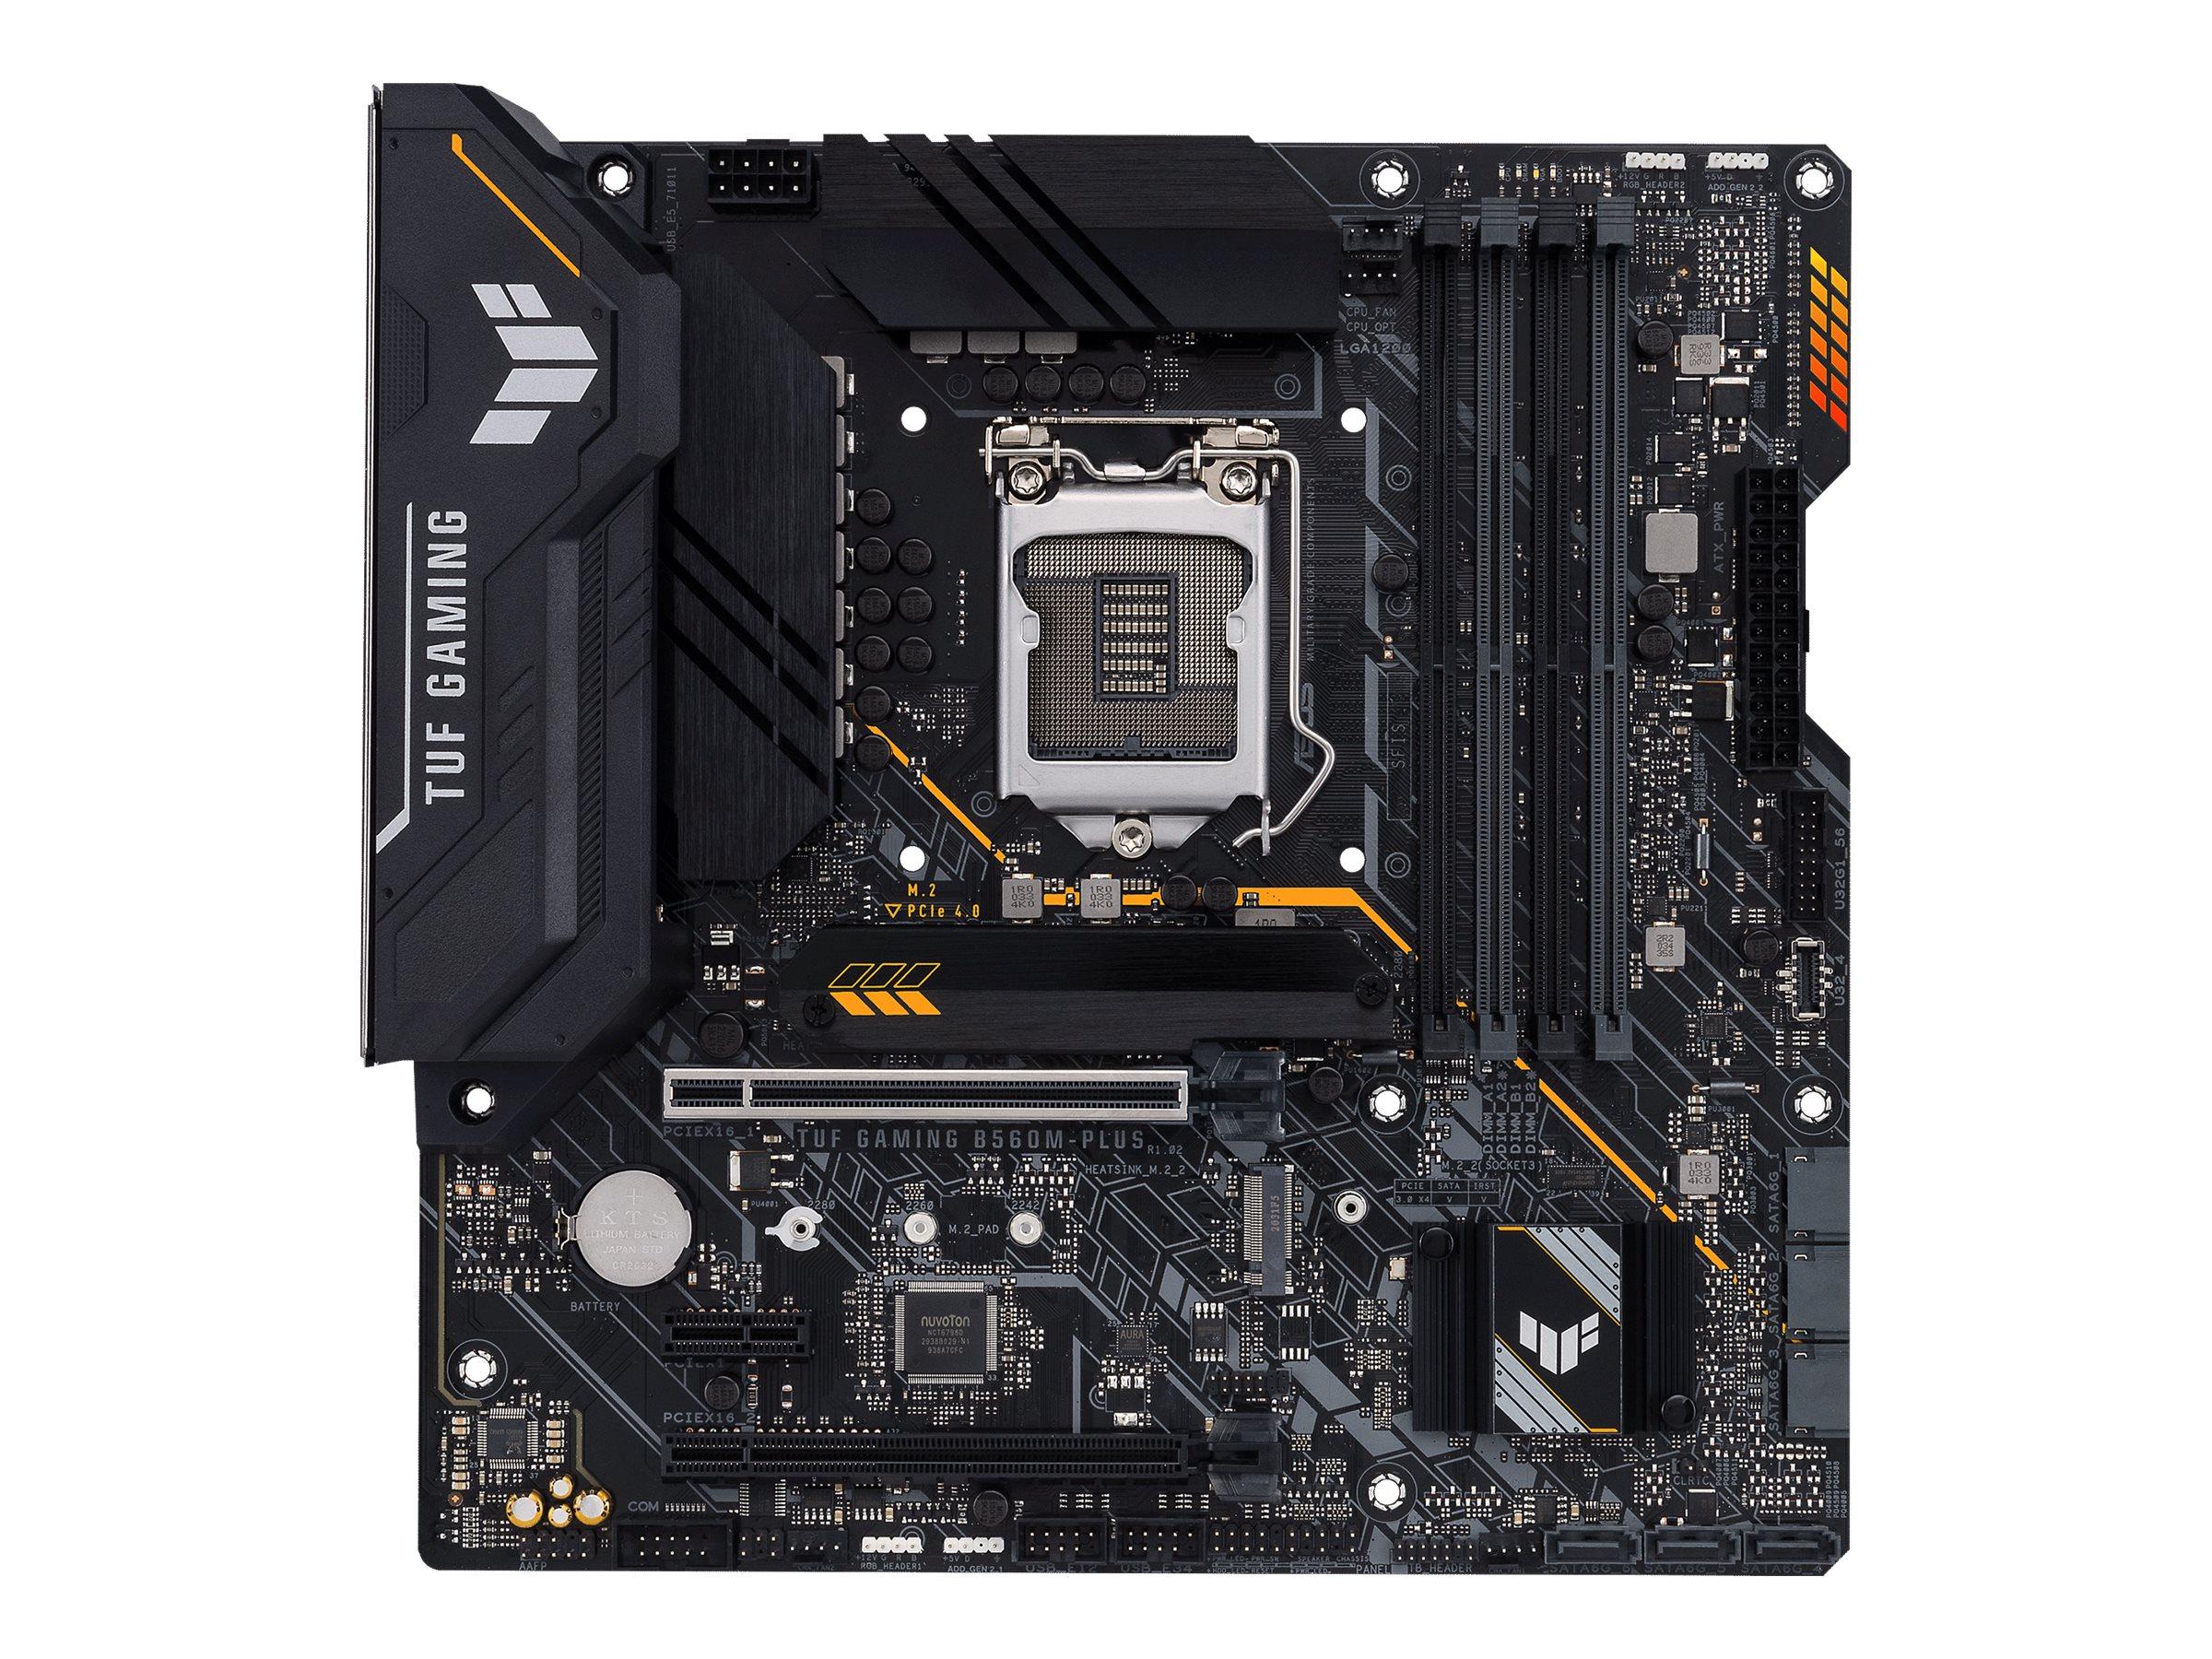 Vorschau: ASUS TUF GAMING B560M-PLUS - Motherboard - ATX - LGA1200-Sockel - B560 - USB-C Gen1, USB 3.2 Gen 1, USB 3.2 Gen 2 - 2.5 Gigabit LAN - Onboard-Grafik (CPU erforderlich)